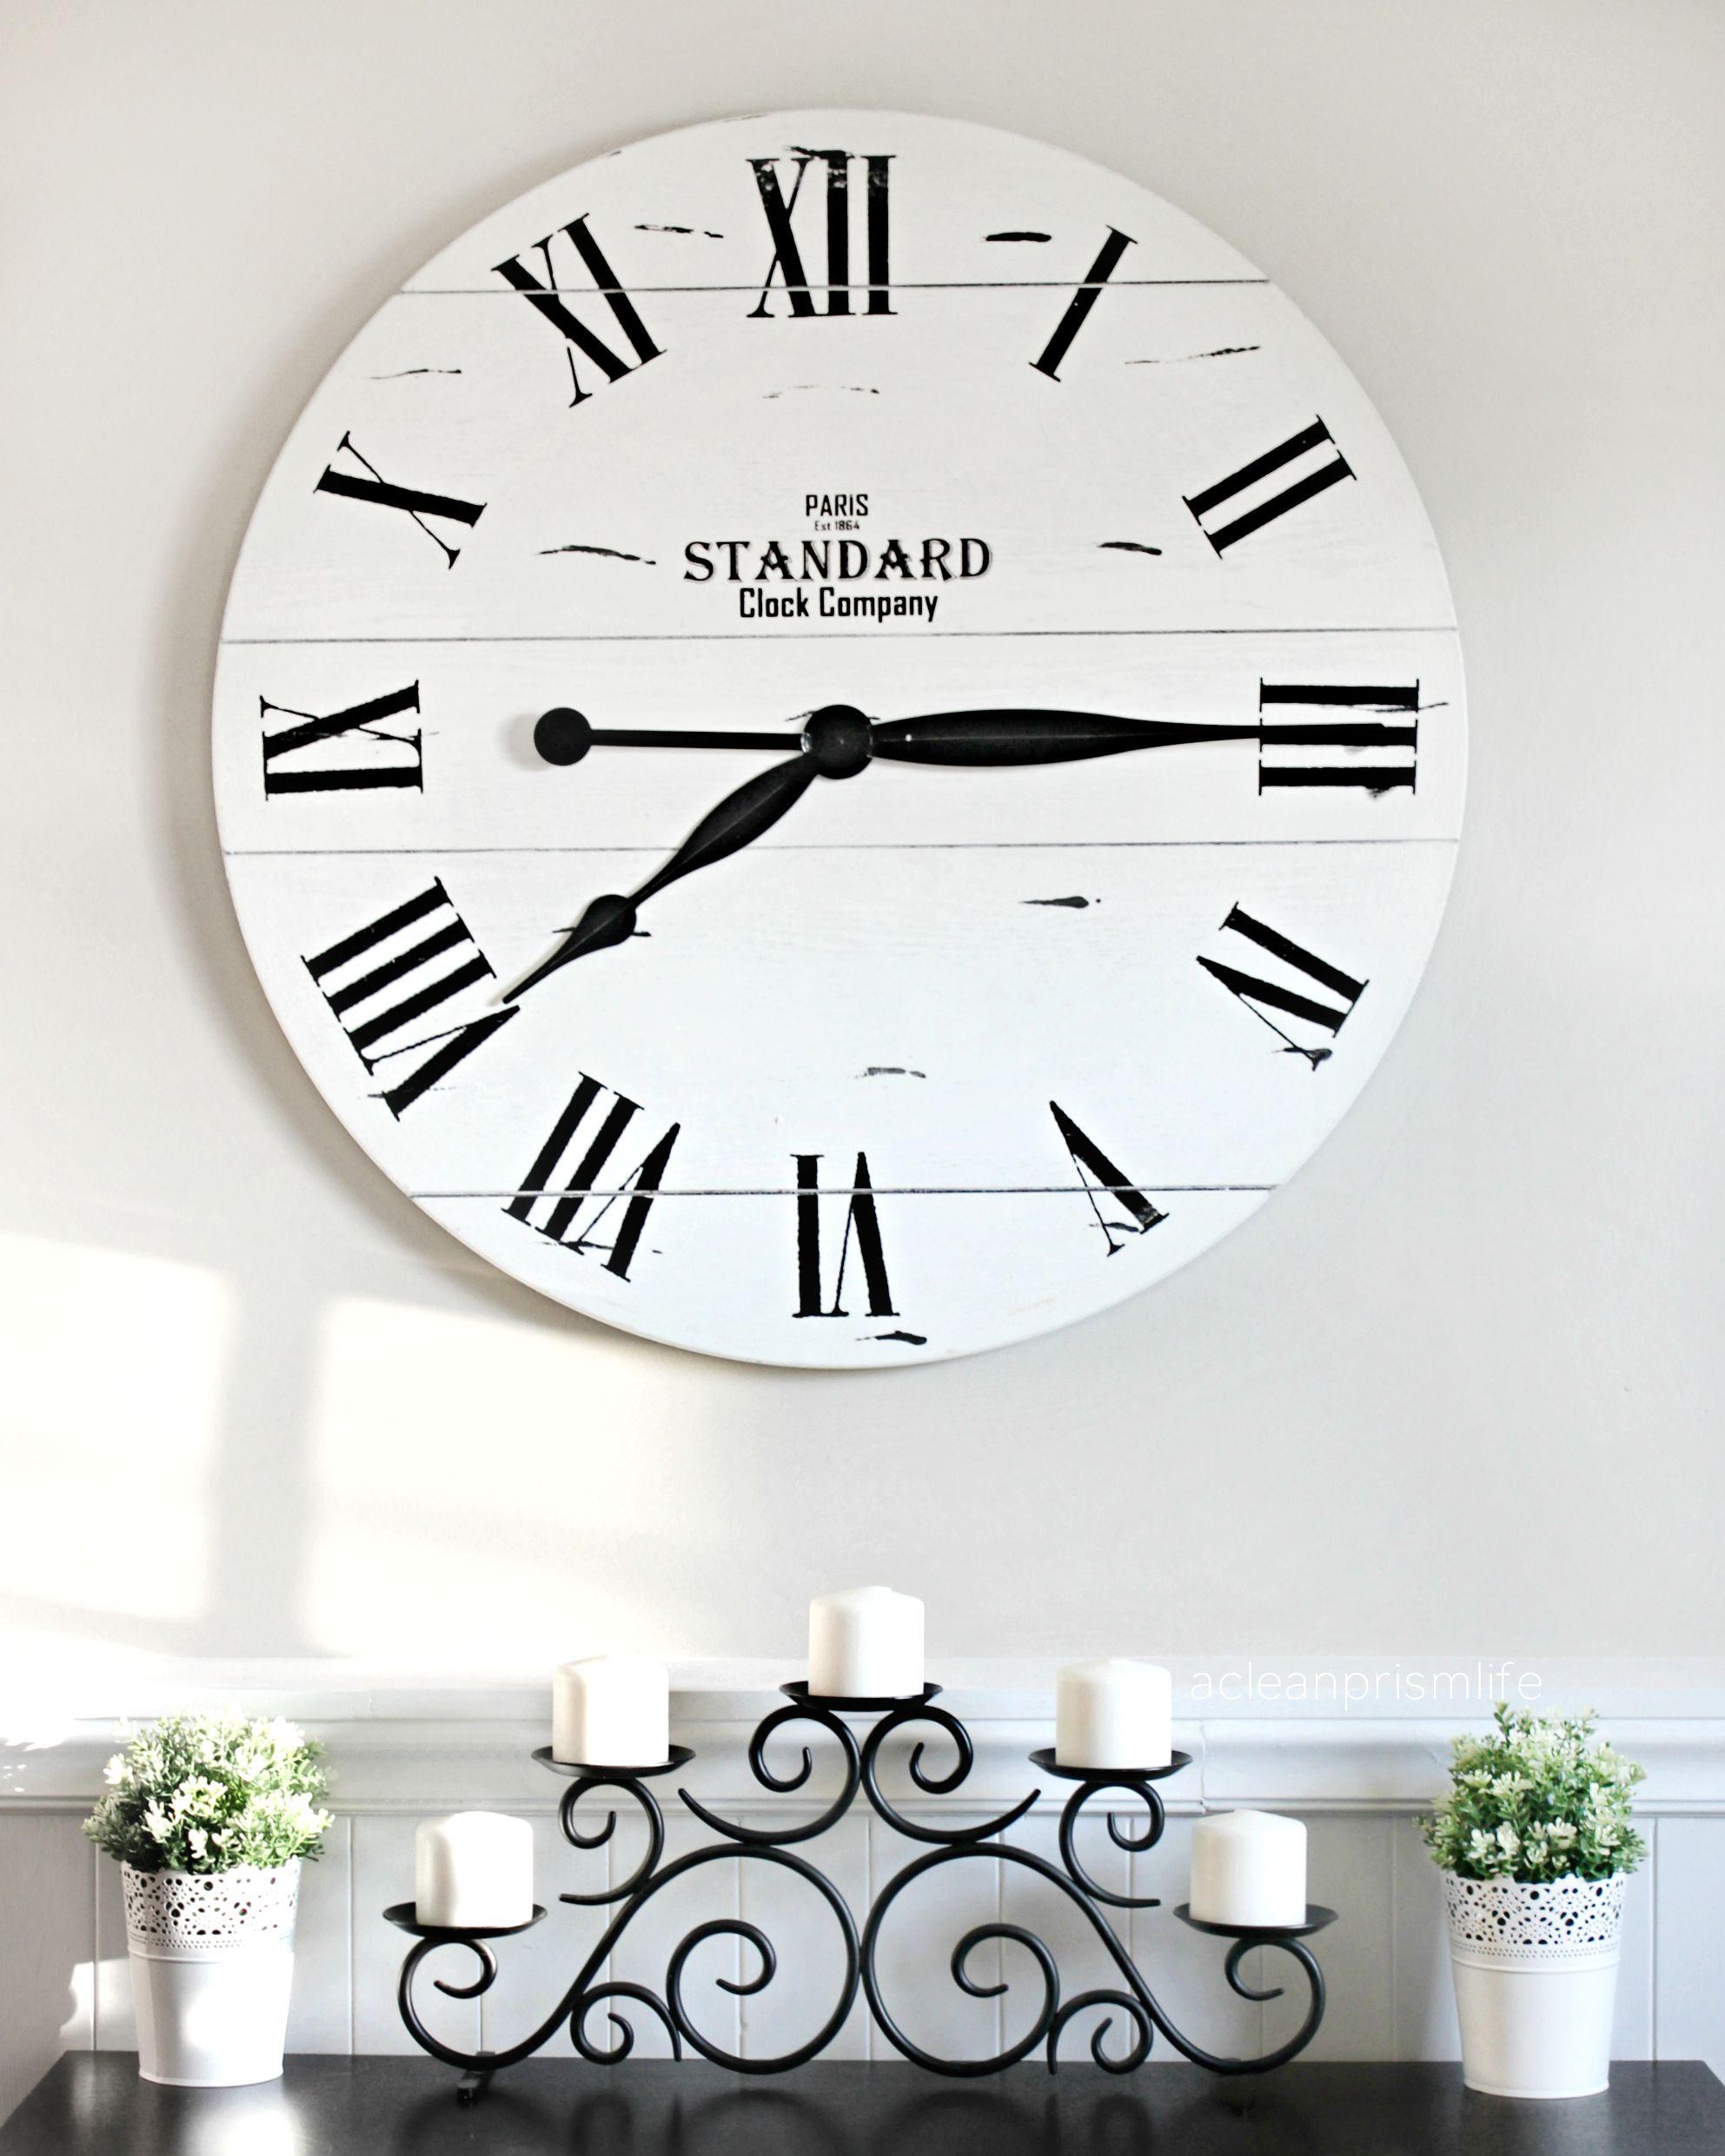 Kirklands clock shiplap black white decor farmhouse style big kirklands clock shiplap black white decor farmhouse style big clocks ikea plants acleanprismlife amipublicfo Images